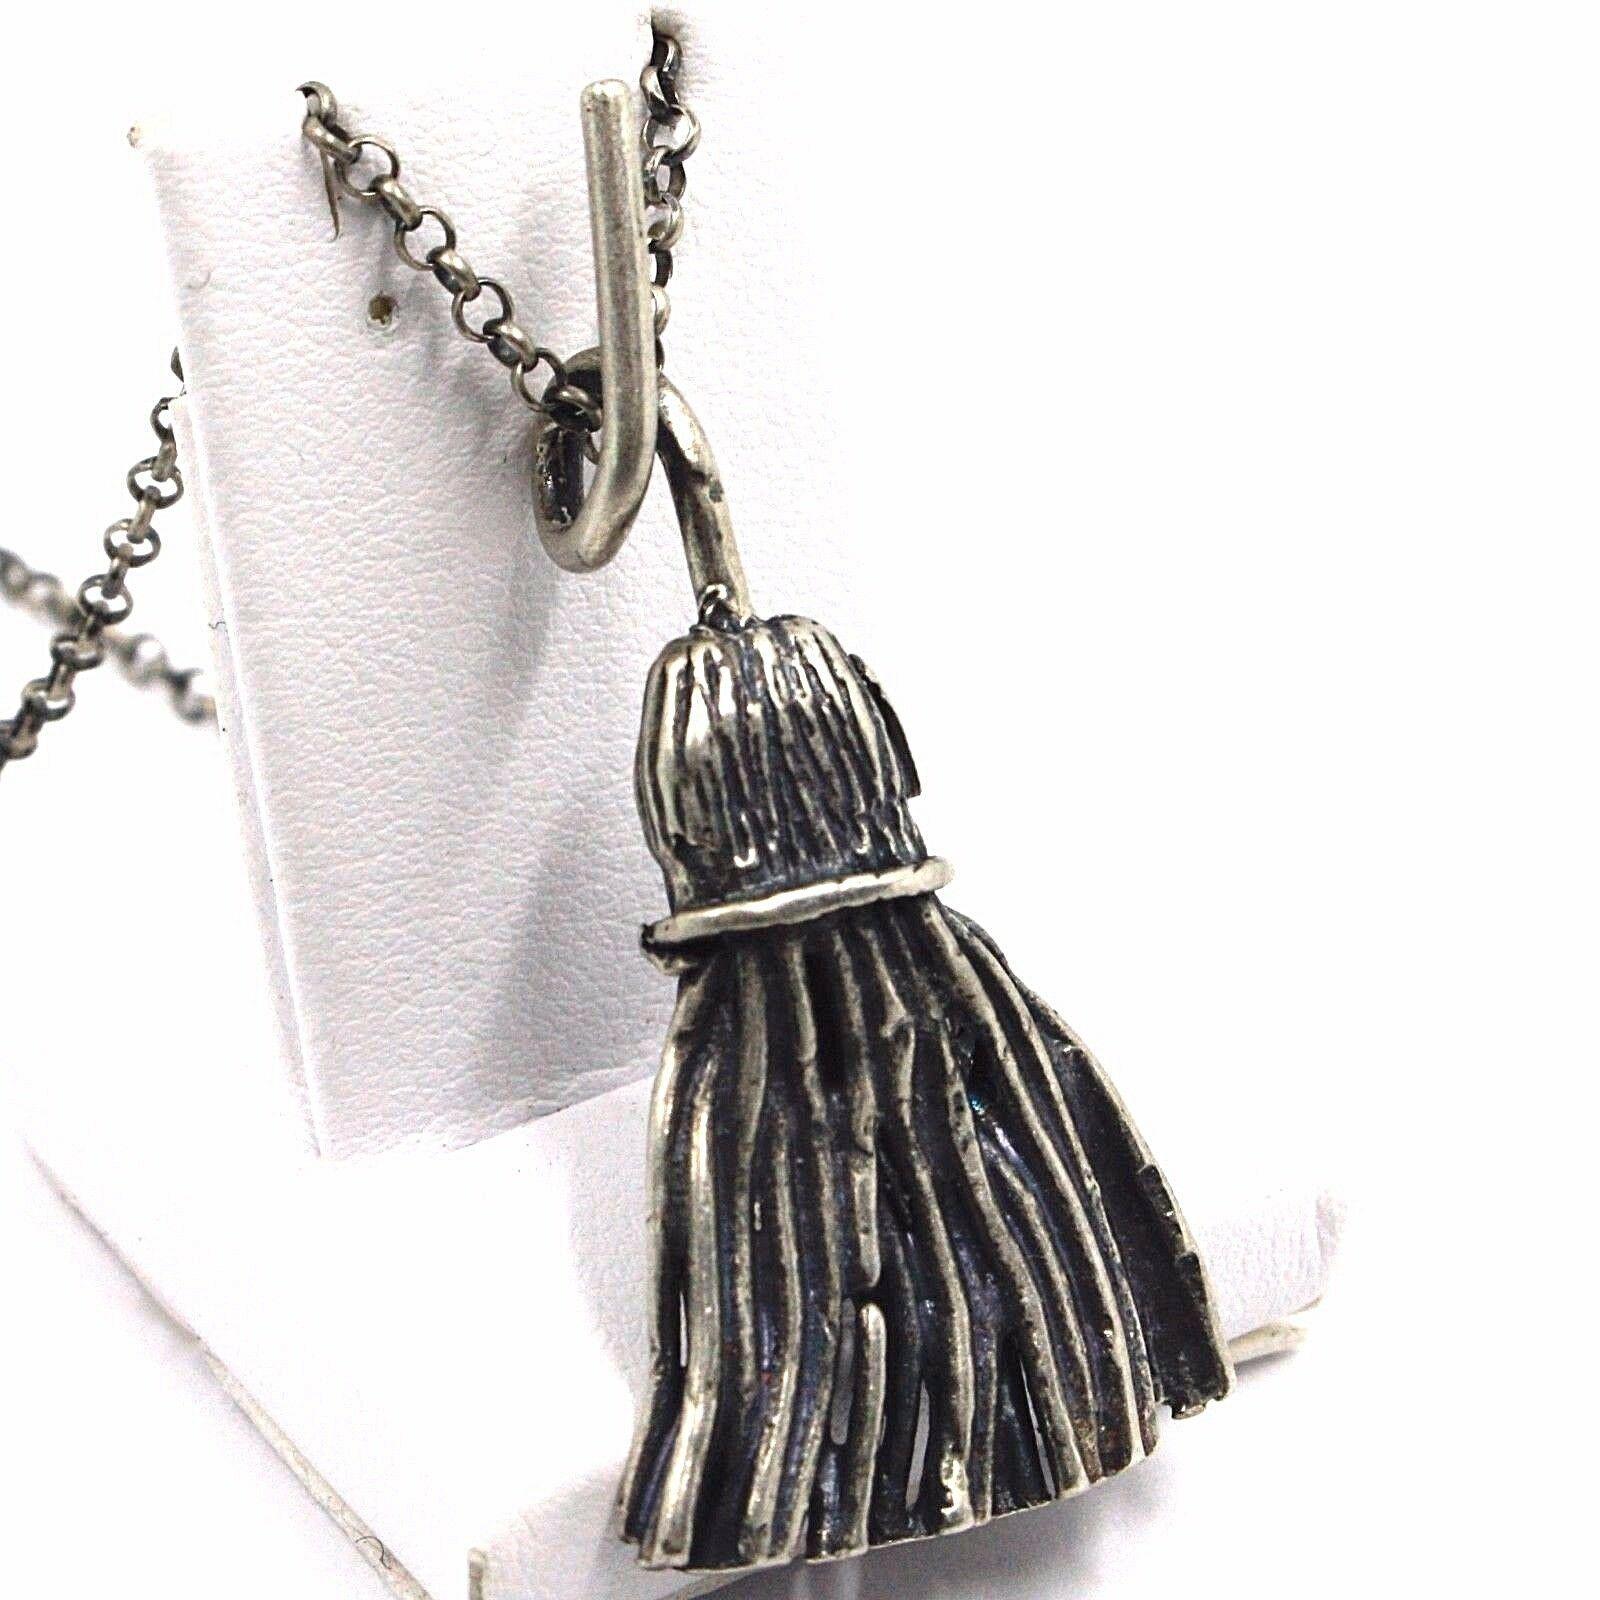 Halskette und Anhänger, Silber 925, Brüniert Matt, Besen, Hexe, Kette Rolo